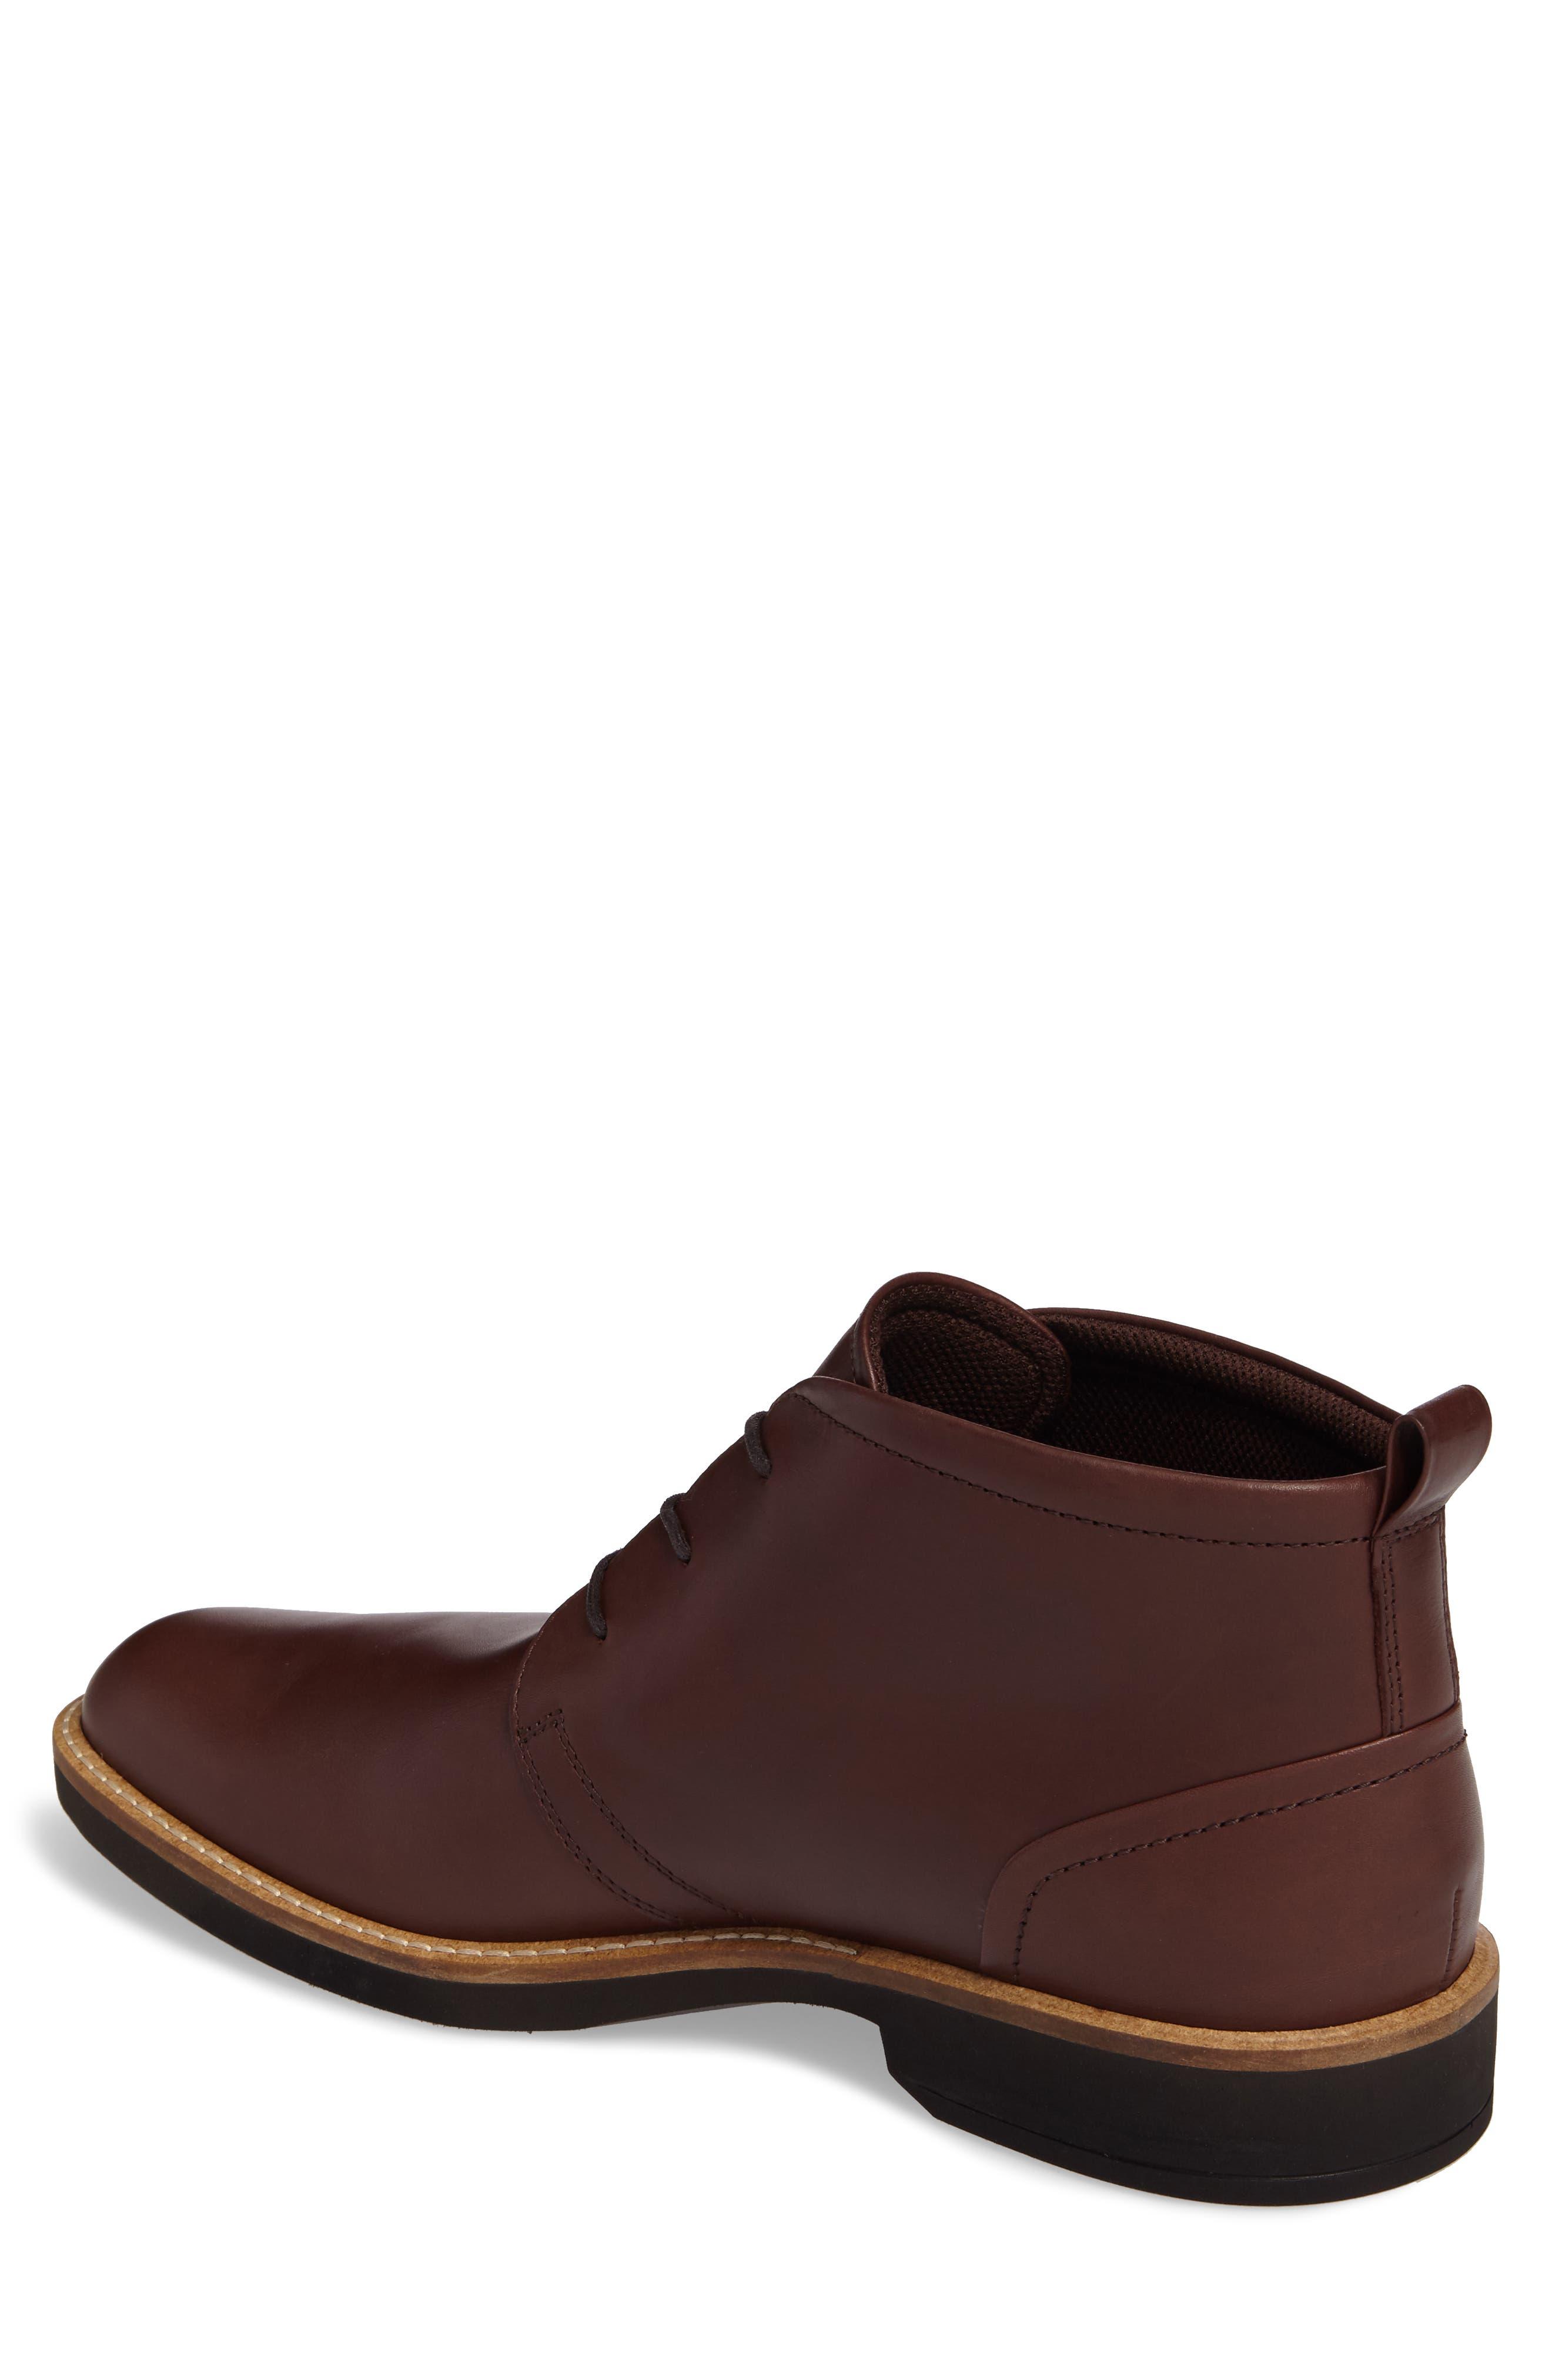 Biarritz Chukka Boot,                             Alternate thumbnail 2, color,                             Rust Leather